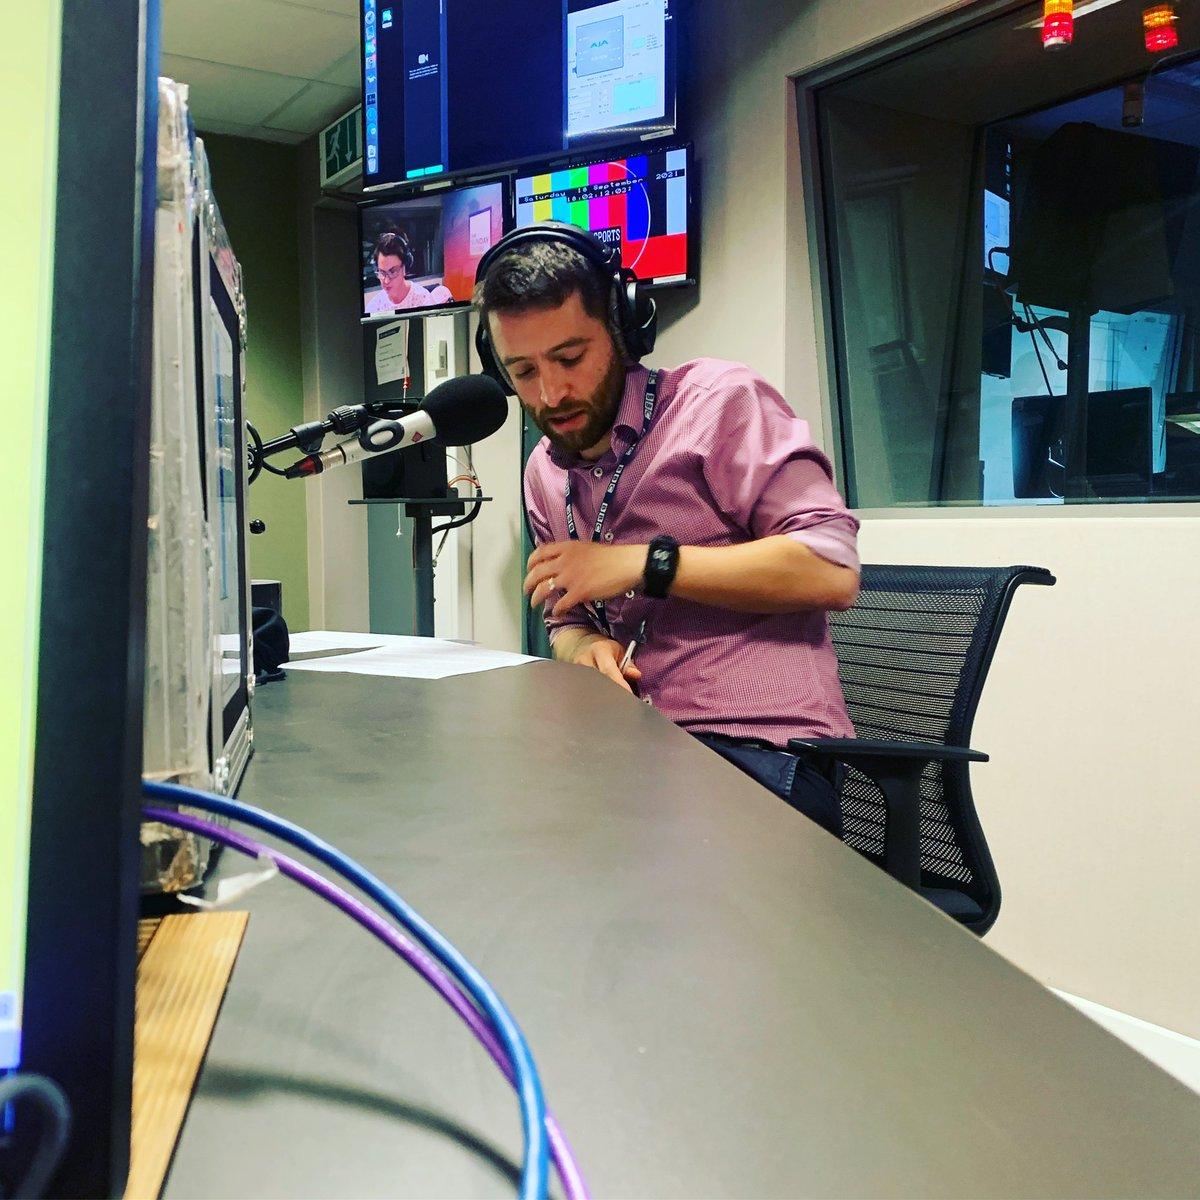 In full flow - @BBCDavidWL #bbcsundayshow @BBCRadioScot